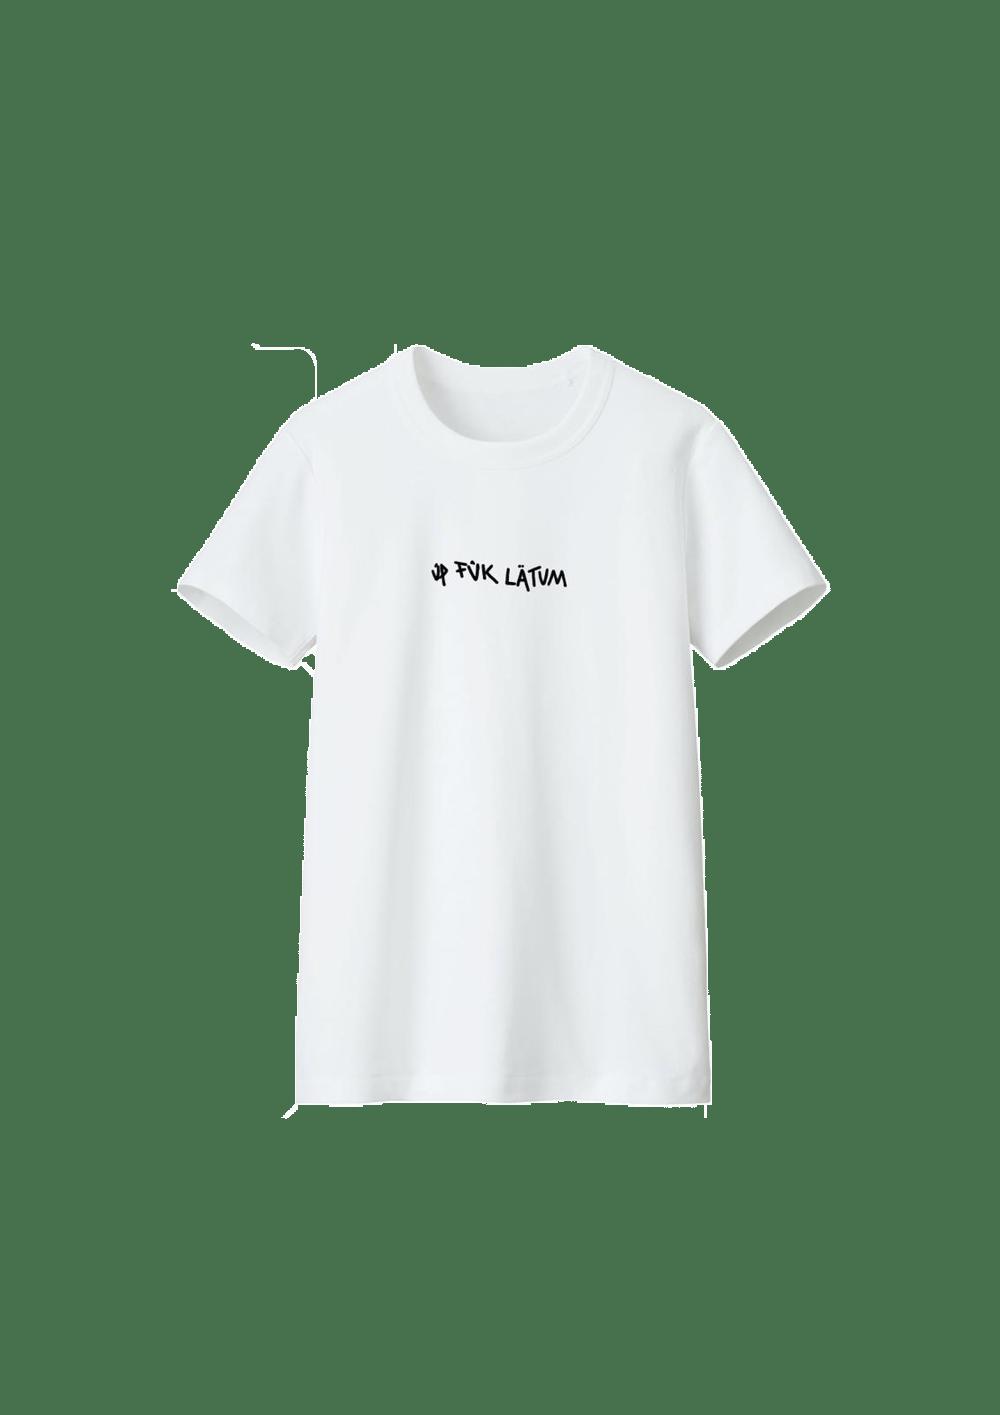 Image of Up FÜk Latum T-shirt (White)